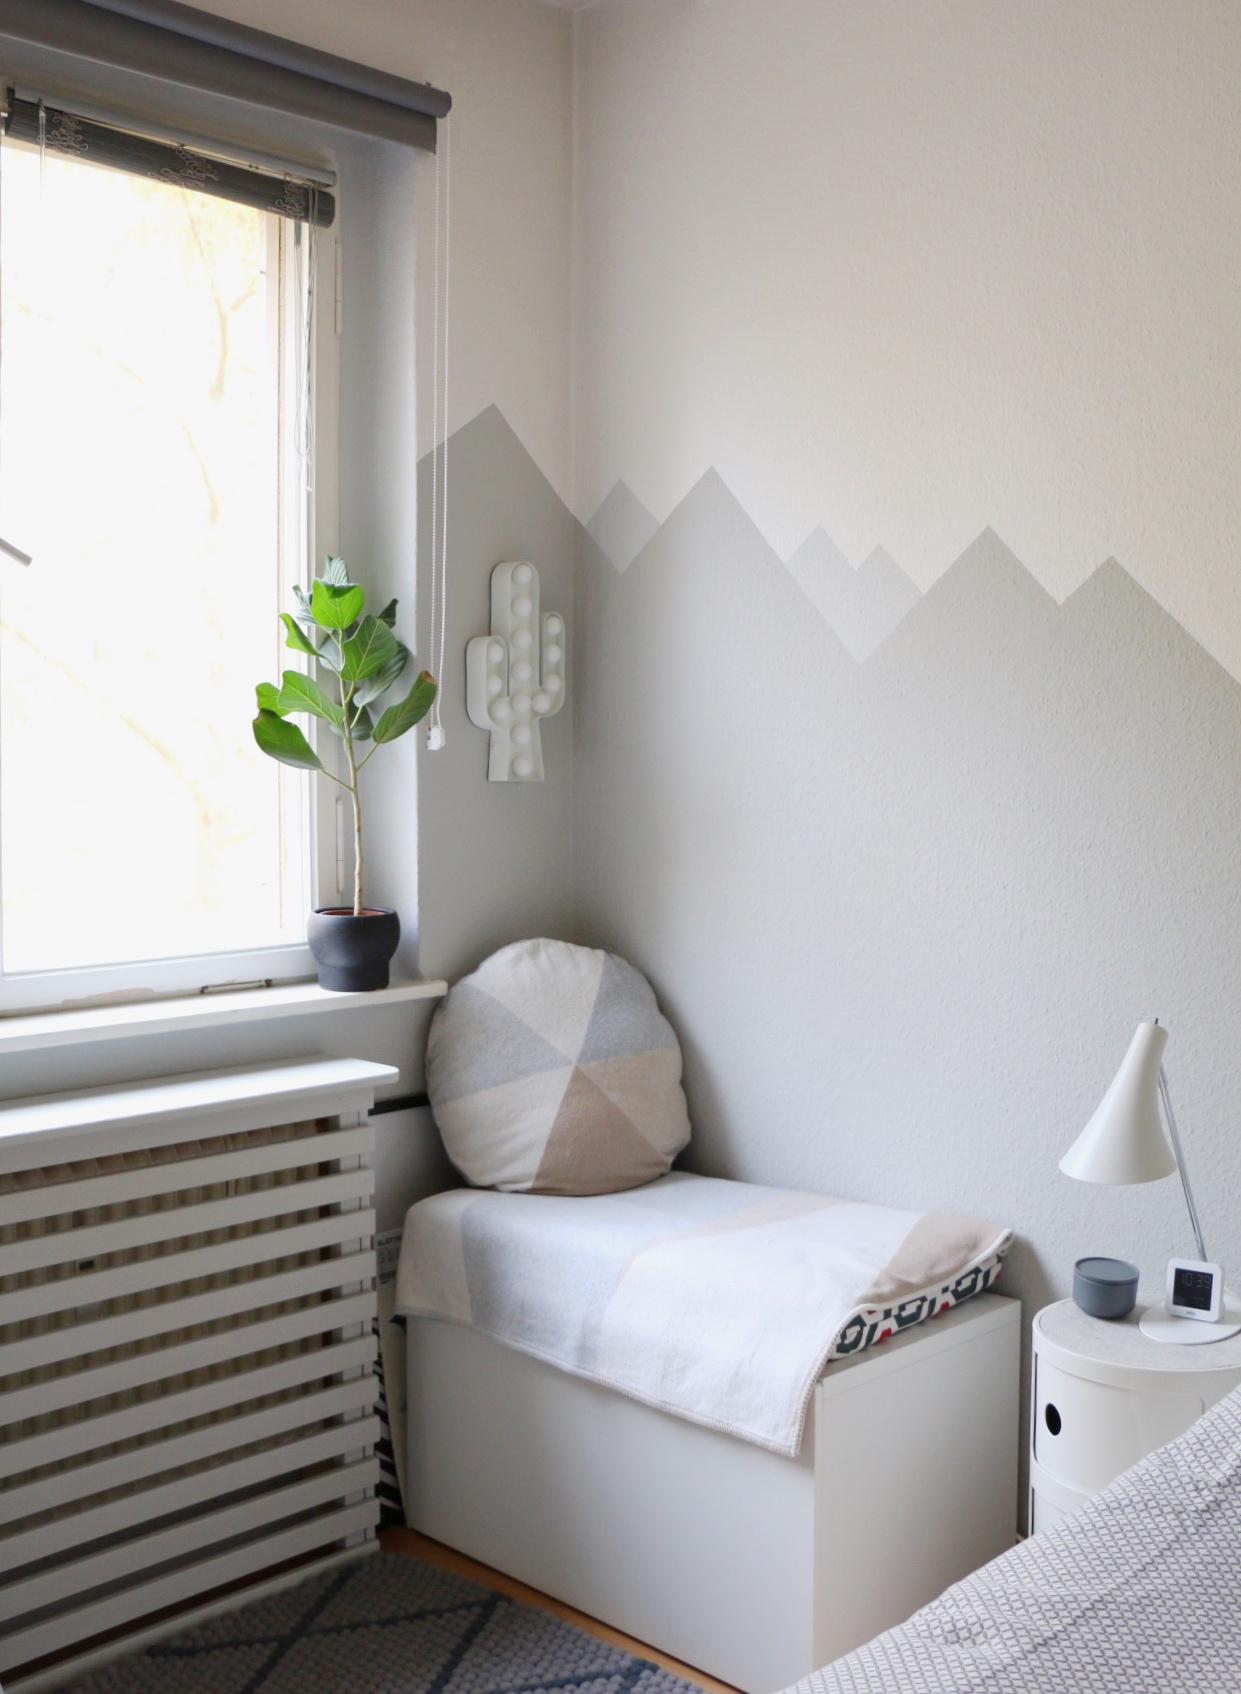 Mountain Nursery Wallpaint - Wandgestaltung im Babyzimmer ...